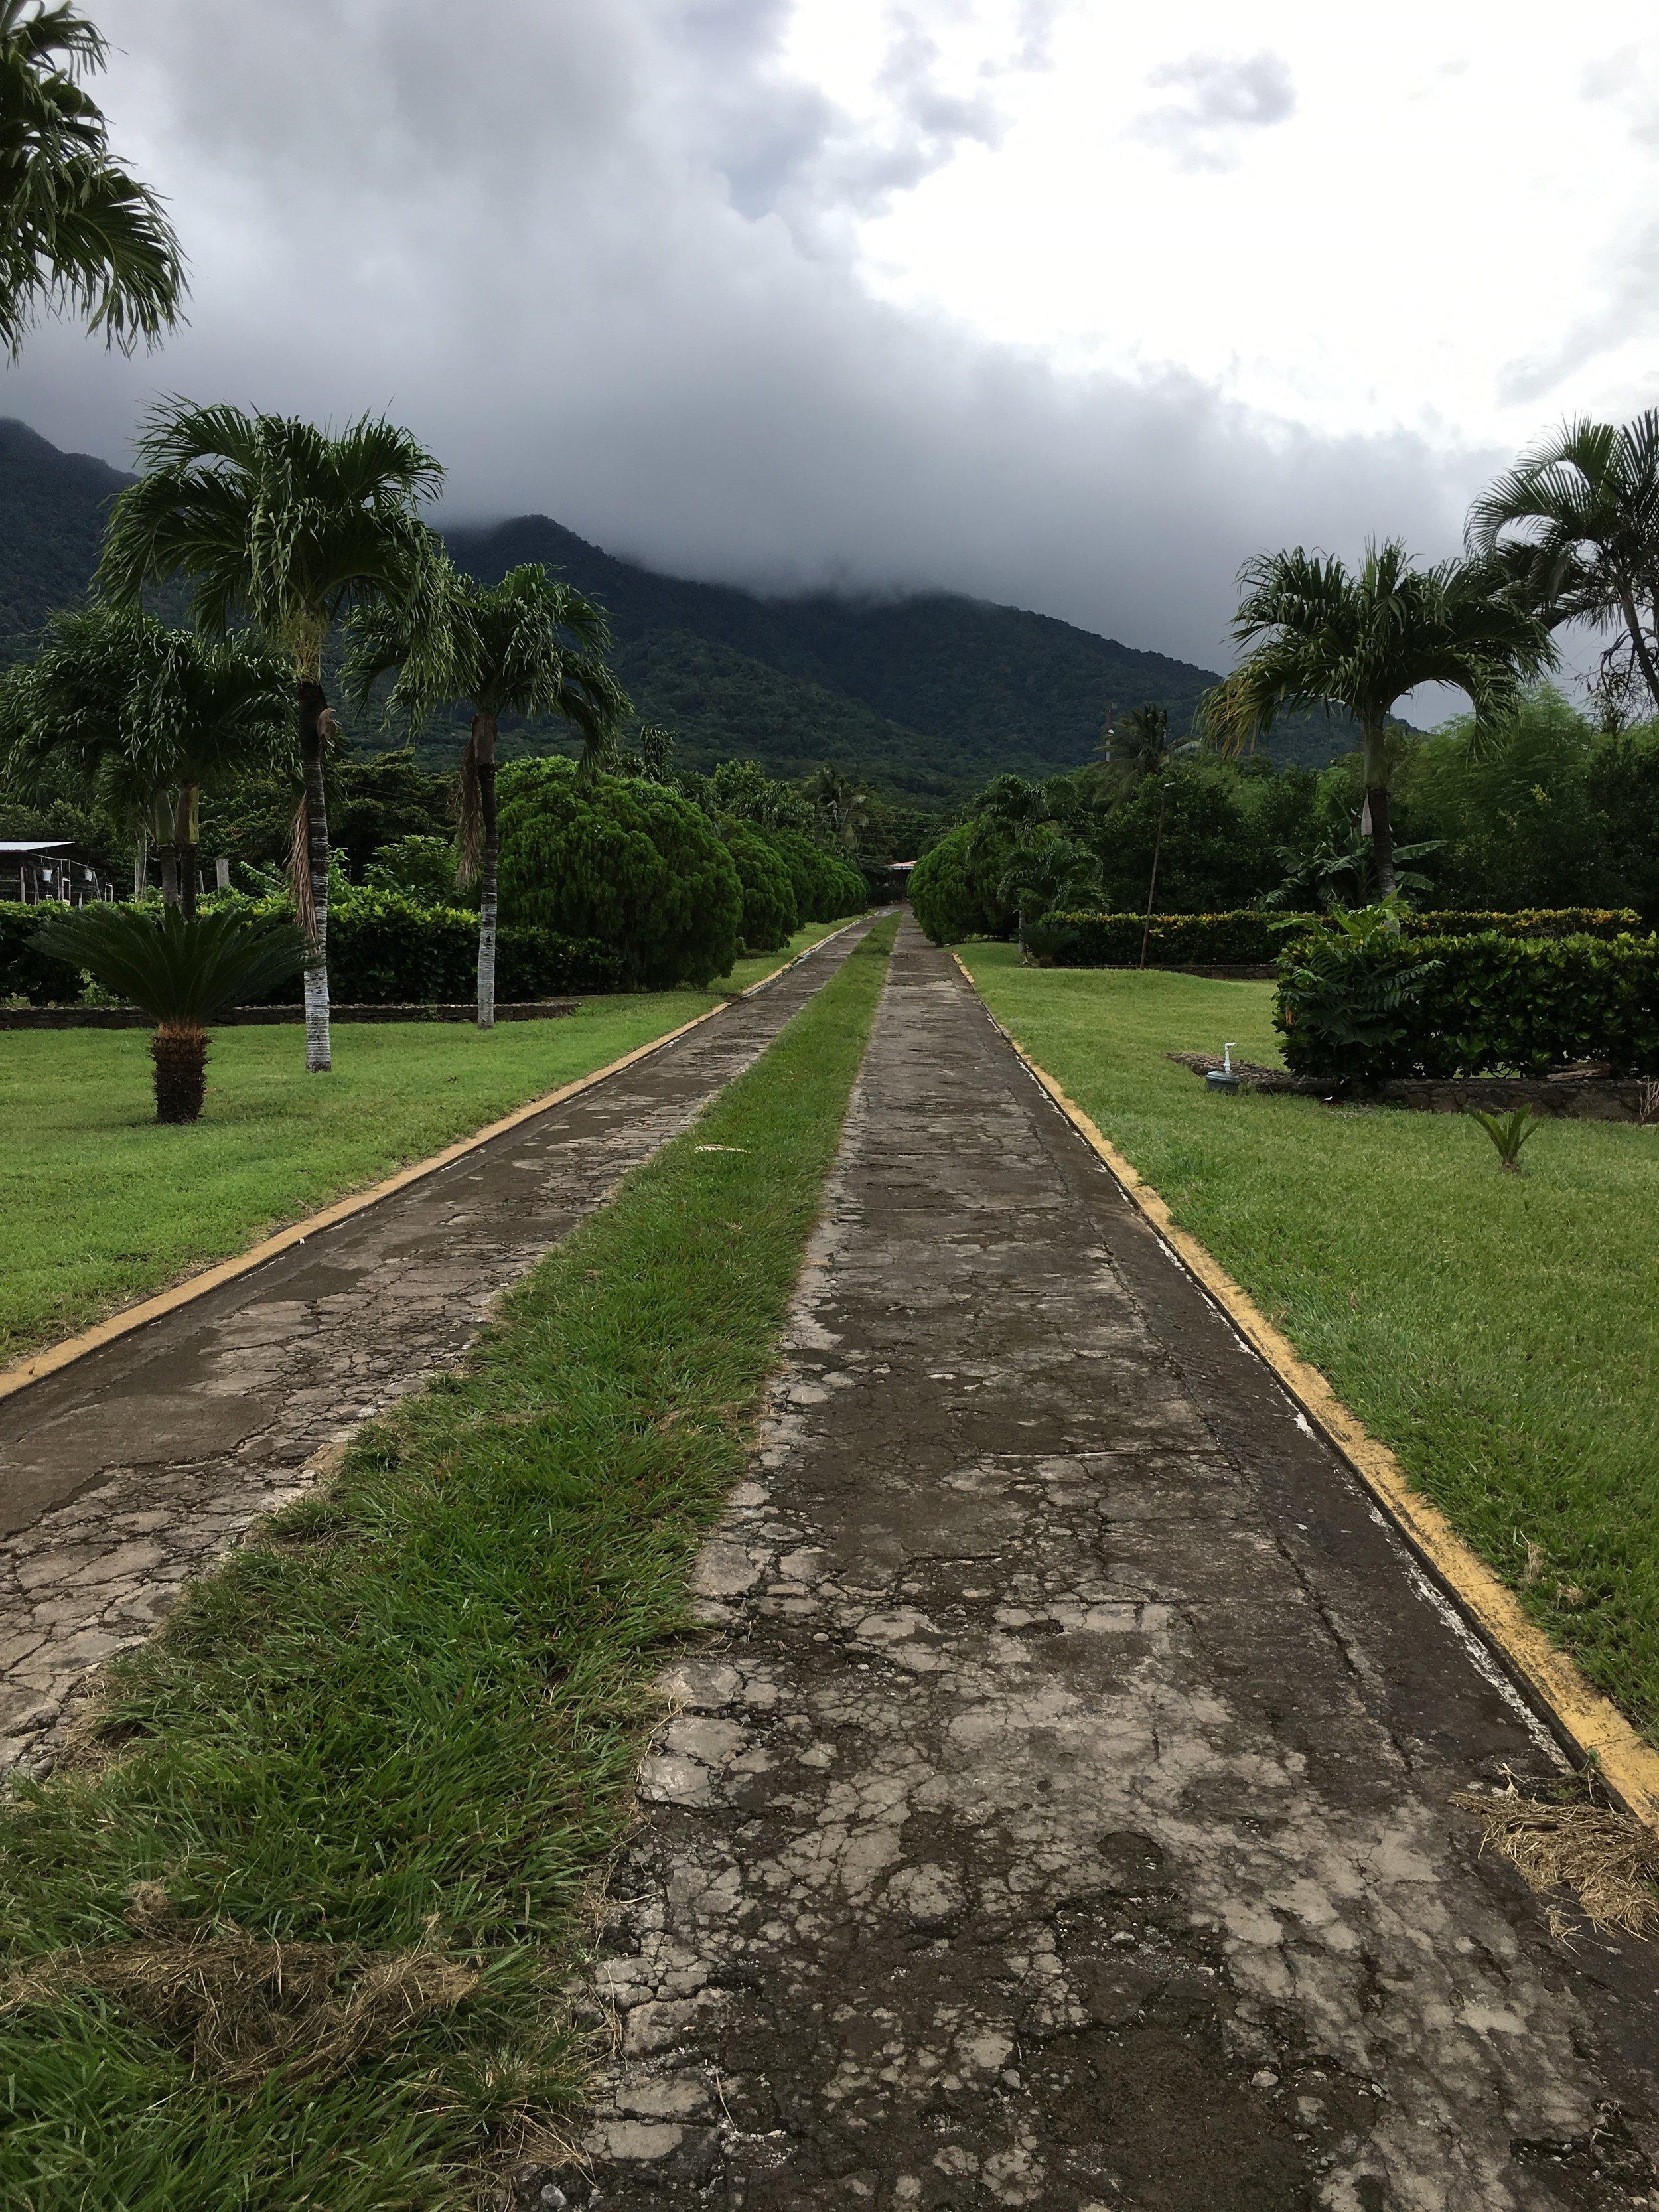 Start at the Ecological Station, walk 2 km on paved/semi-paved roads